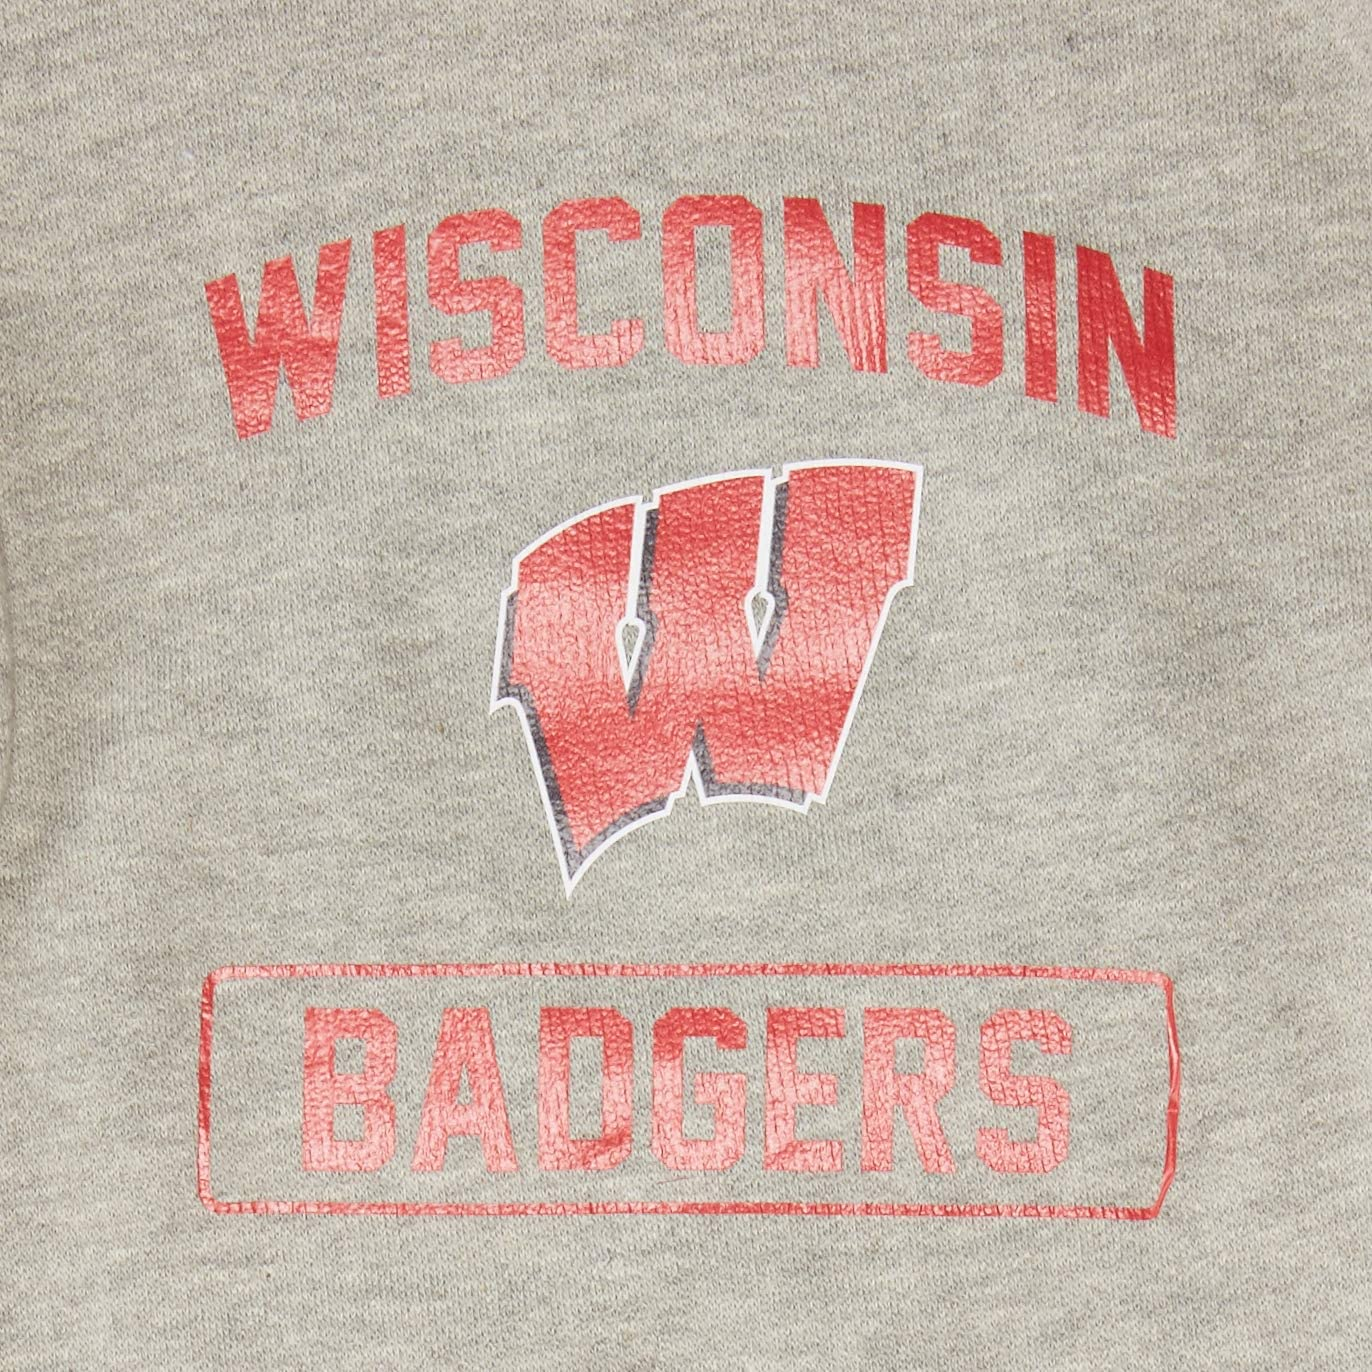 NCAA Wisconsin Badgers LittlearthNCAA Pet Hooded Crewneck Type